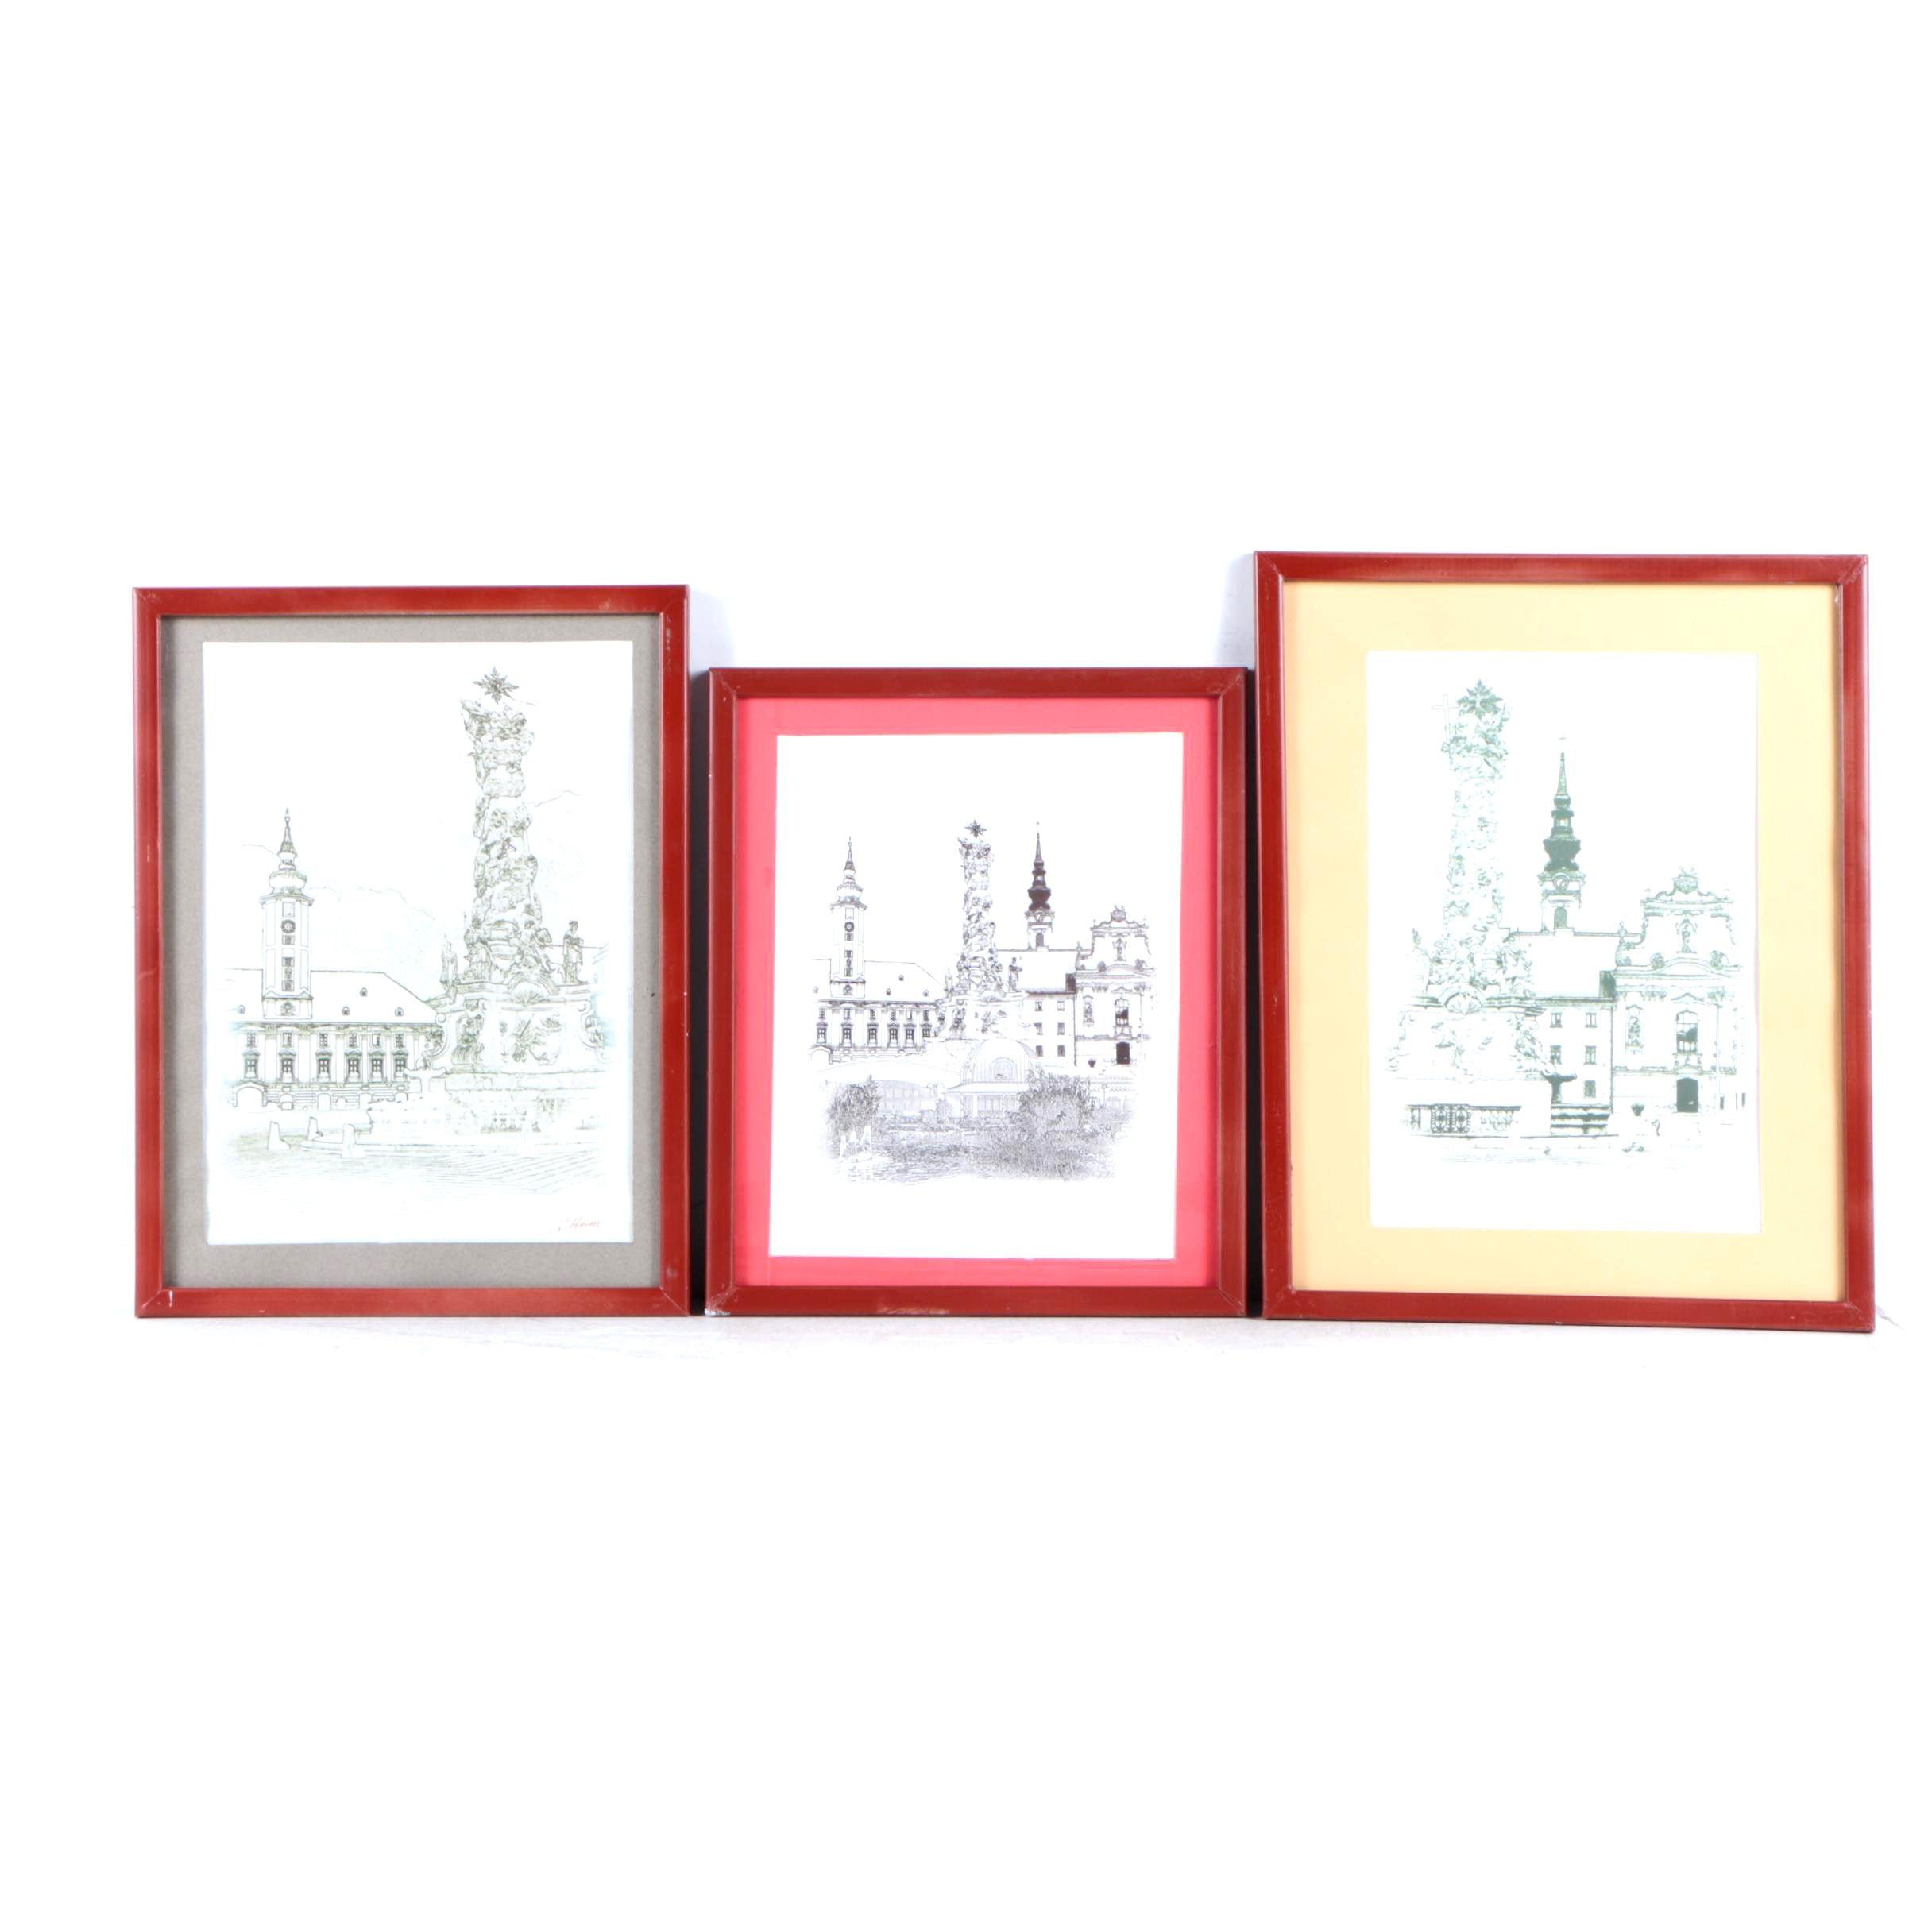 L. Heinz Offset Lithographs of European Architecture